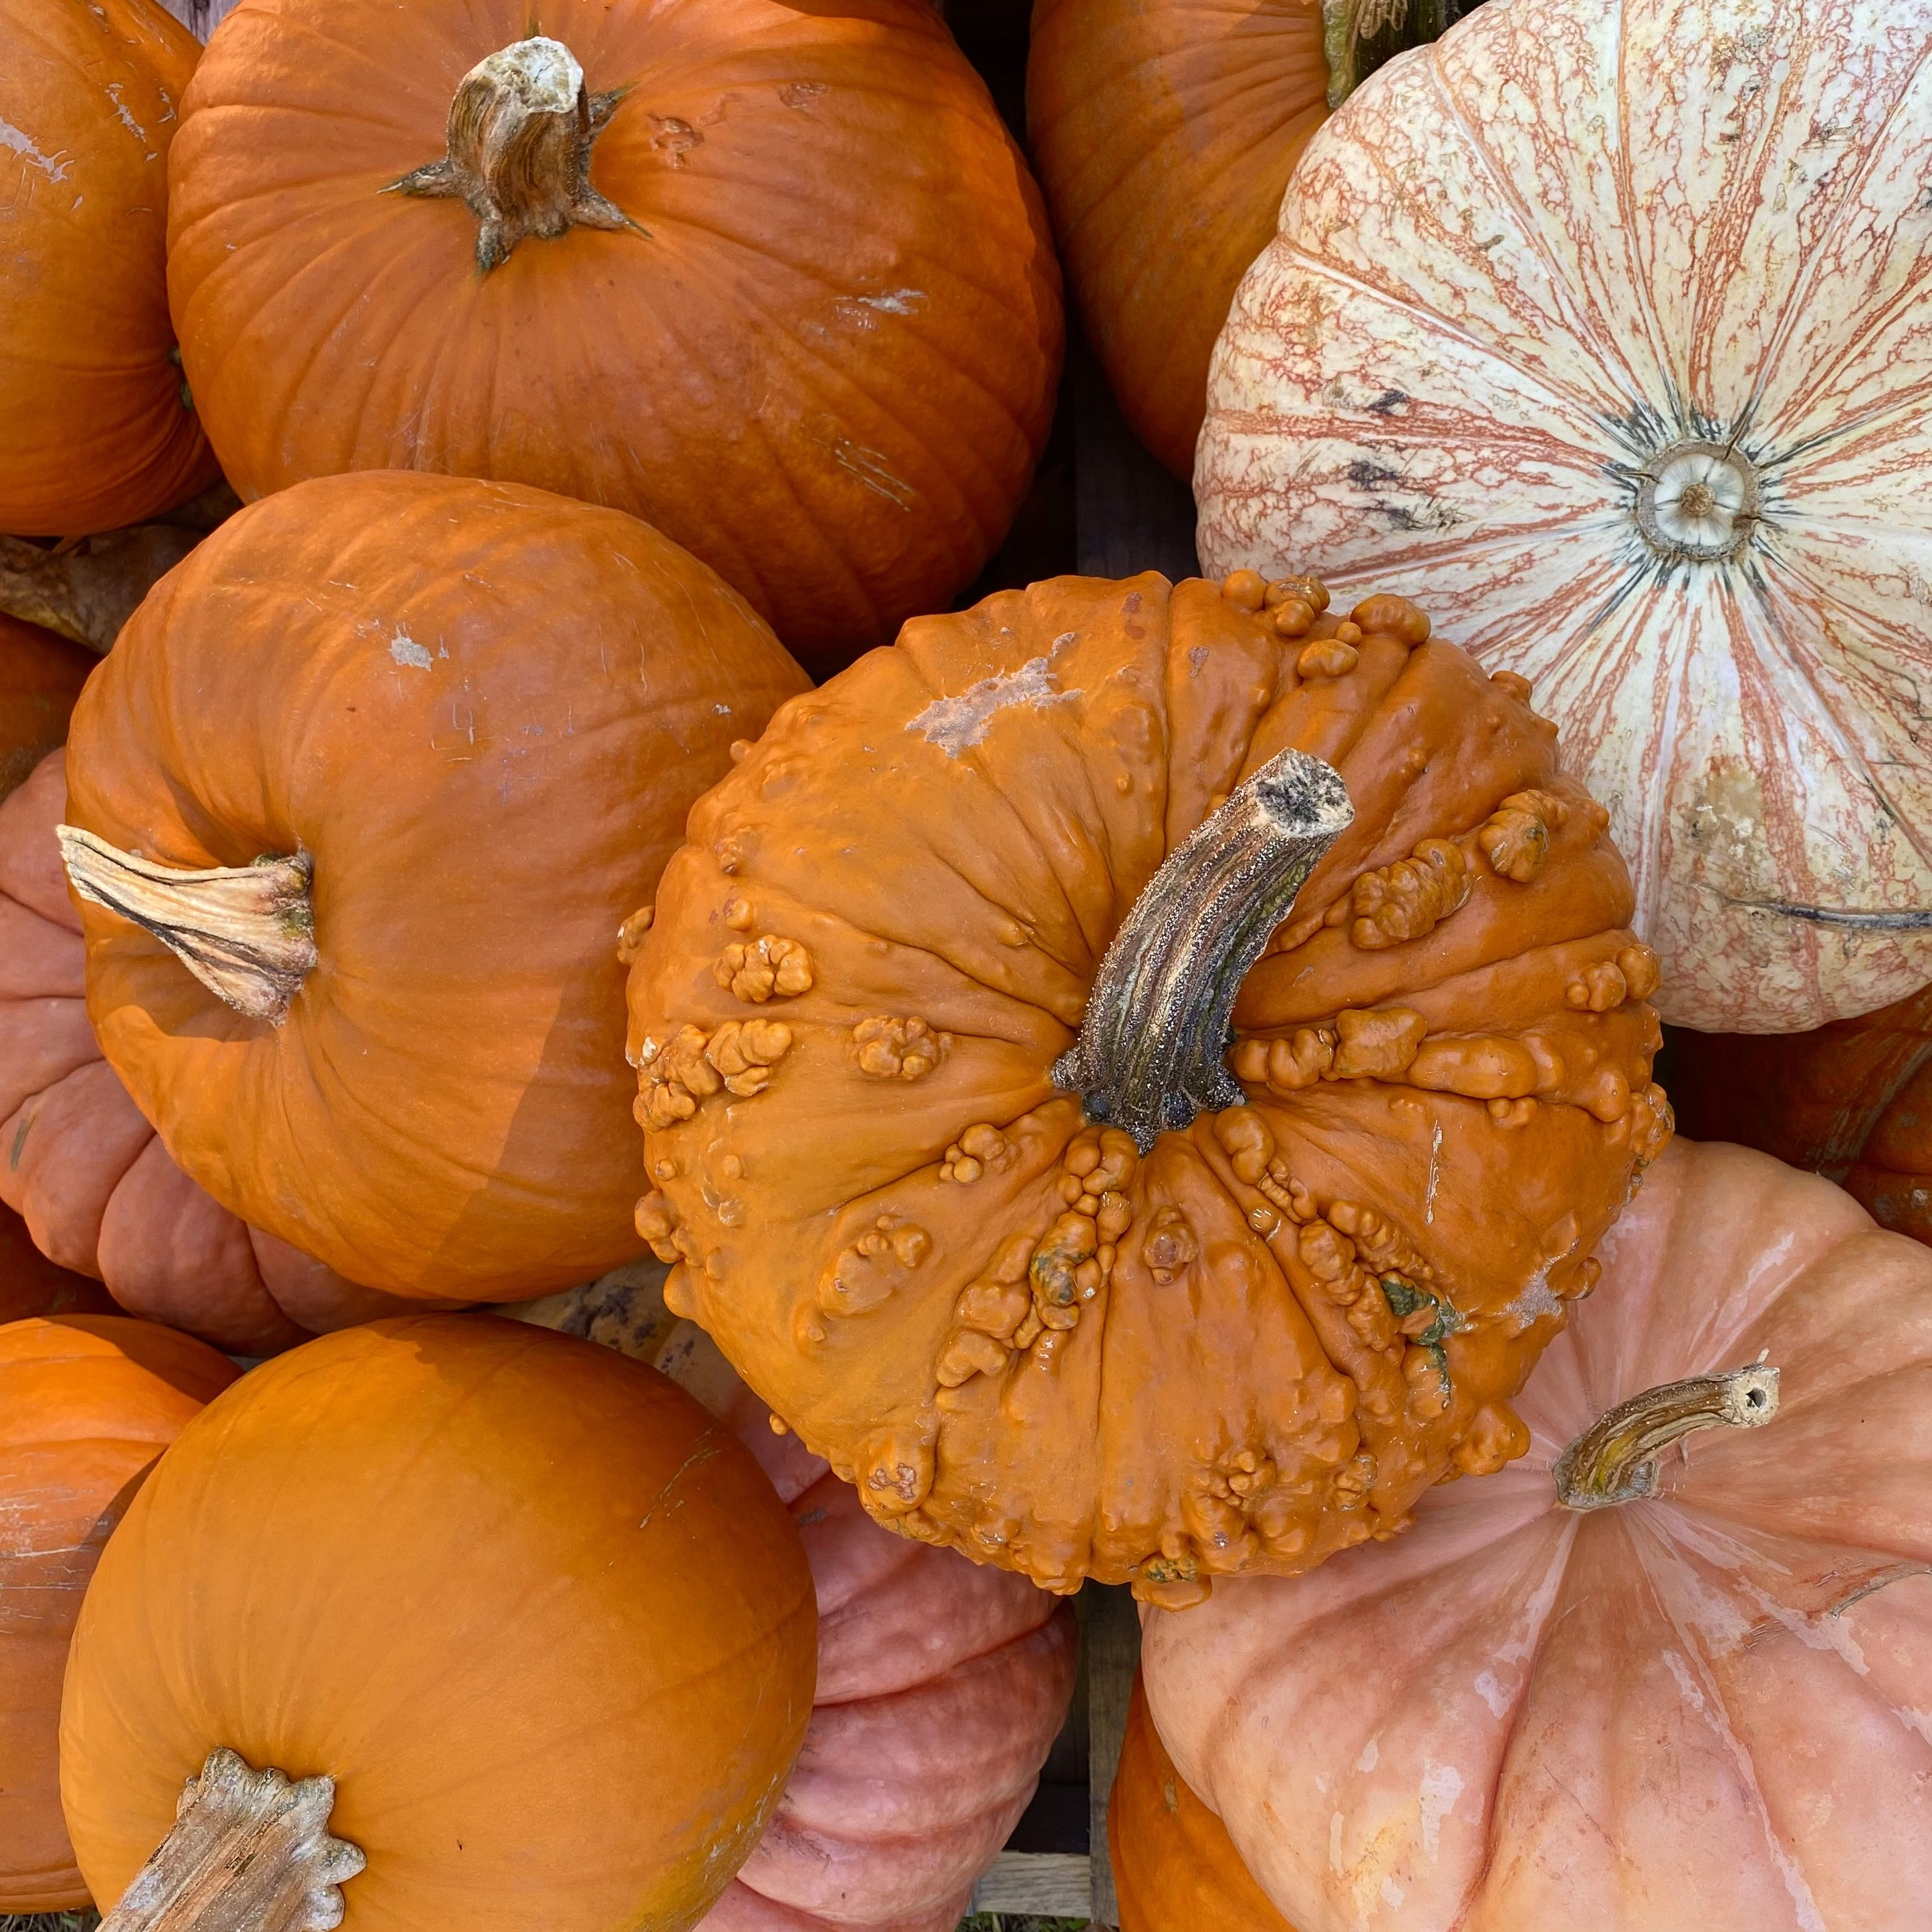 #pumpkinpicking #pumpkins #autumndecor #autumn #falldecorating #pumpkinseason #gourds #cooking #Halloweenpumpkins #Halloween #Thanksgivingdecor #pumpkinvarieties #fallvegetables #fallgardening #farmtotable